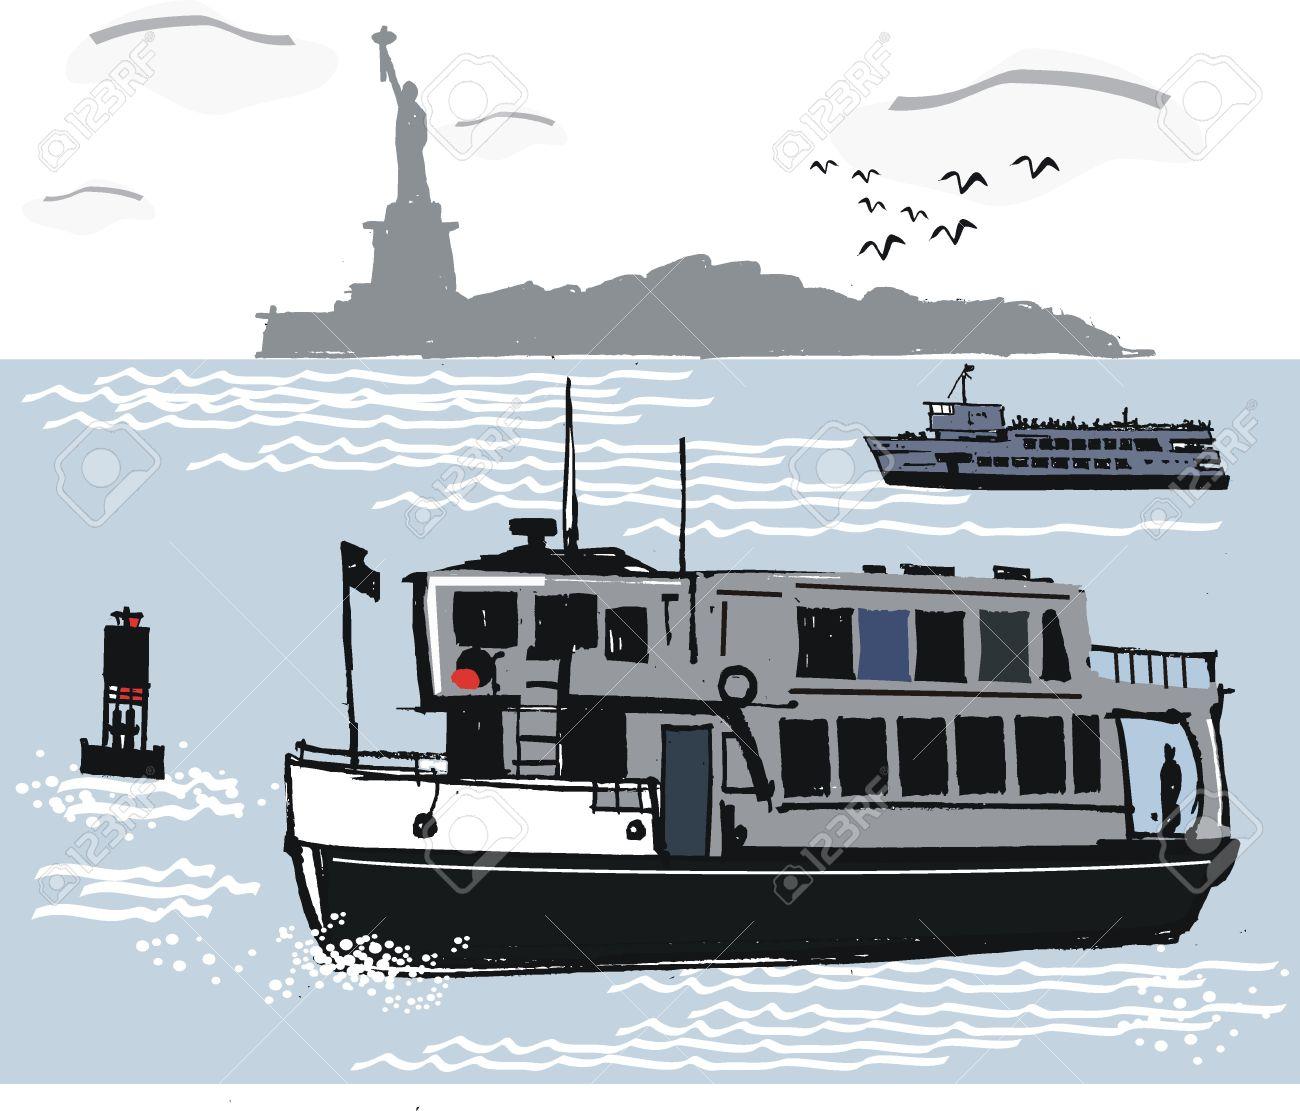 Staten island ferry clipart - Clipground